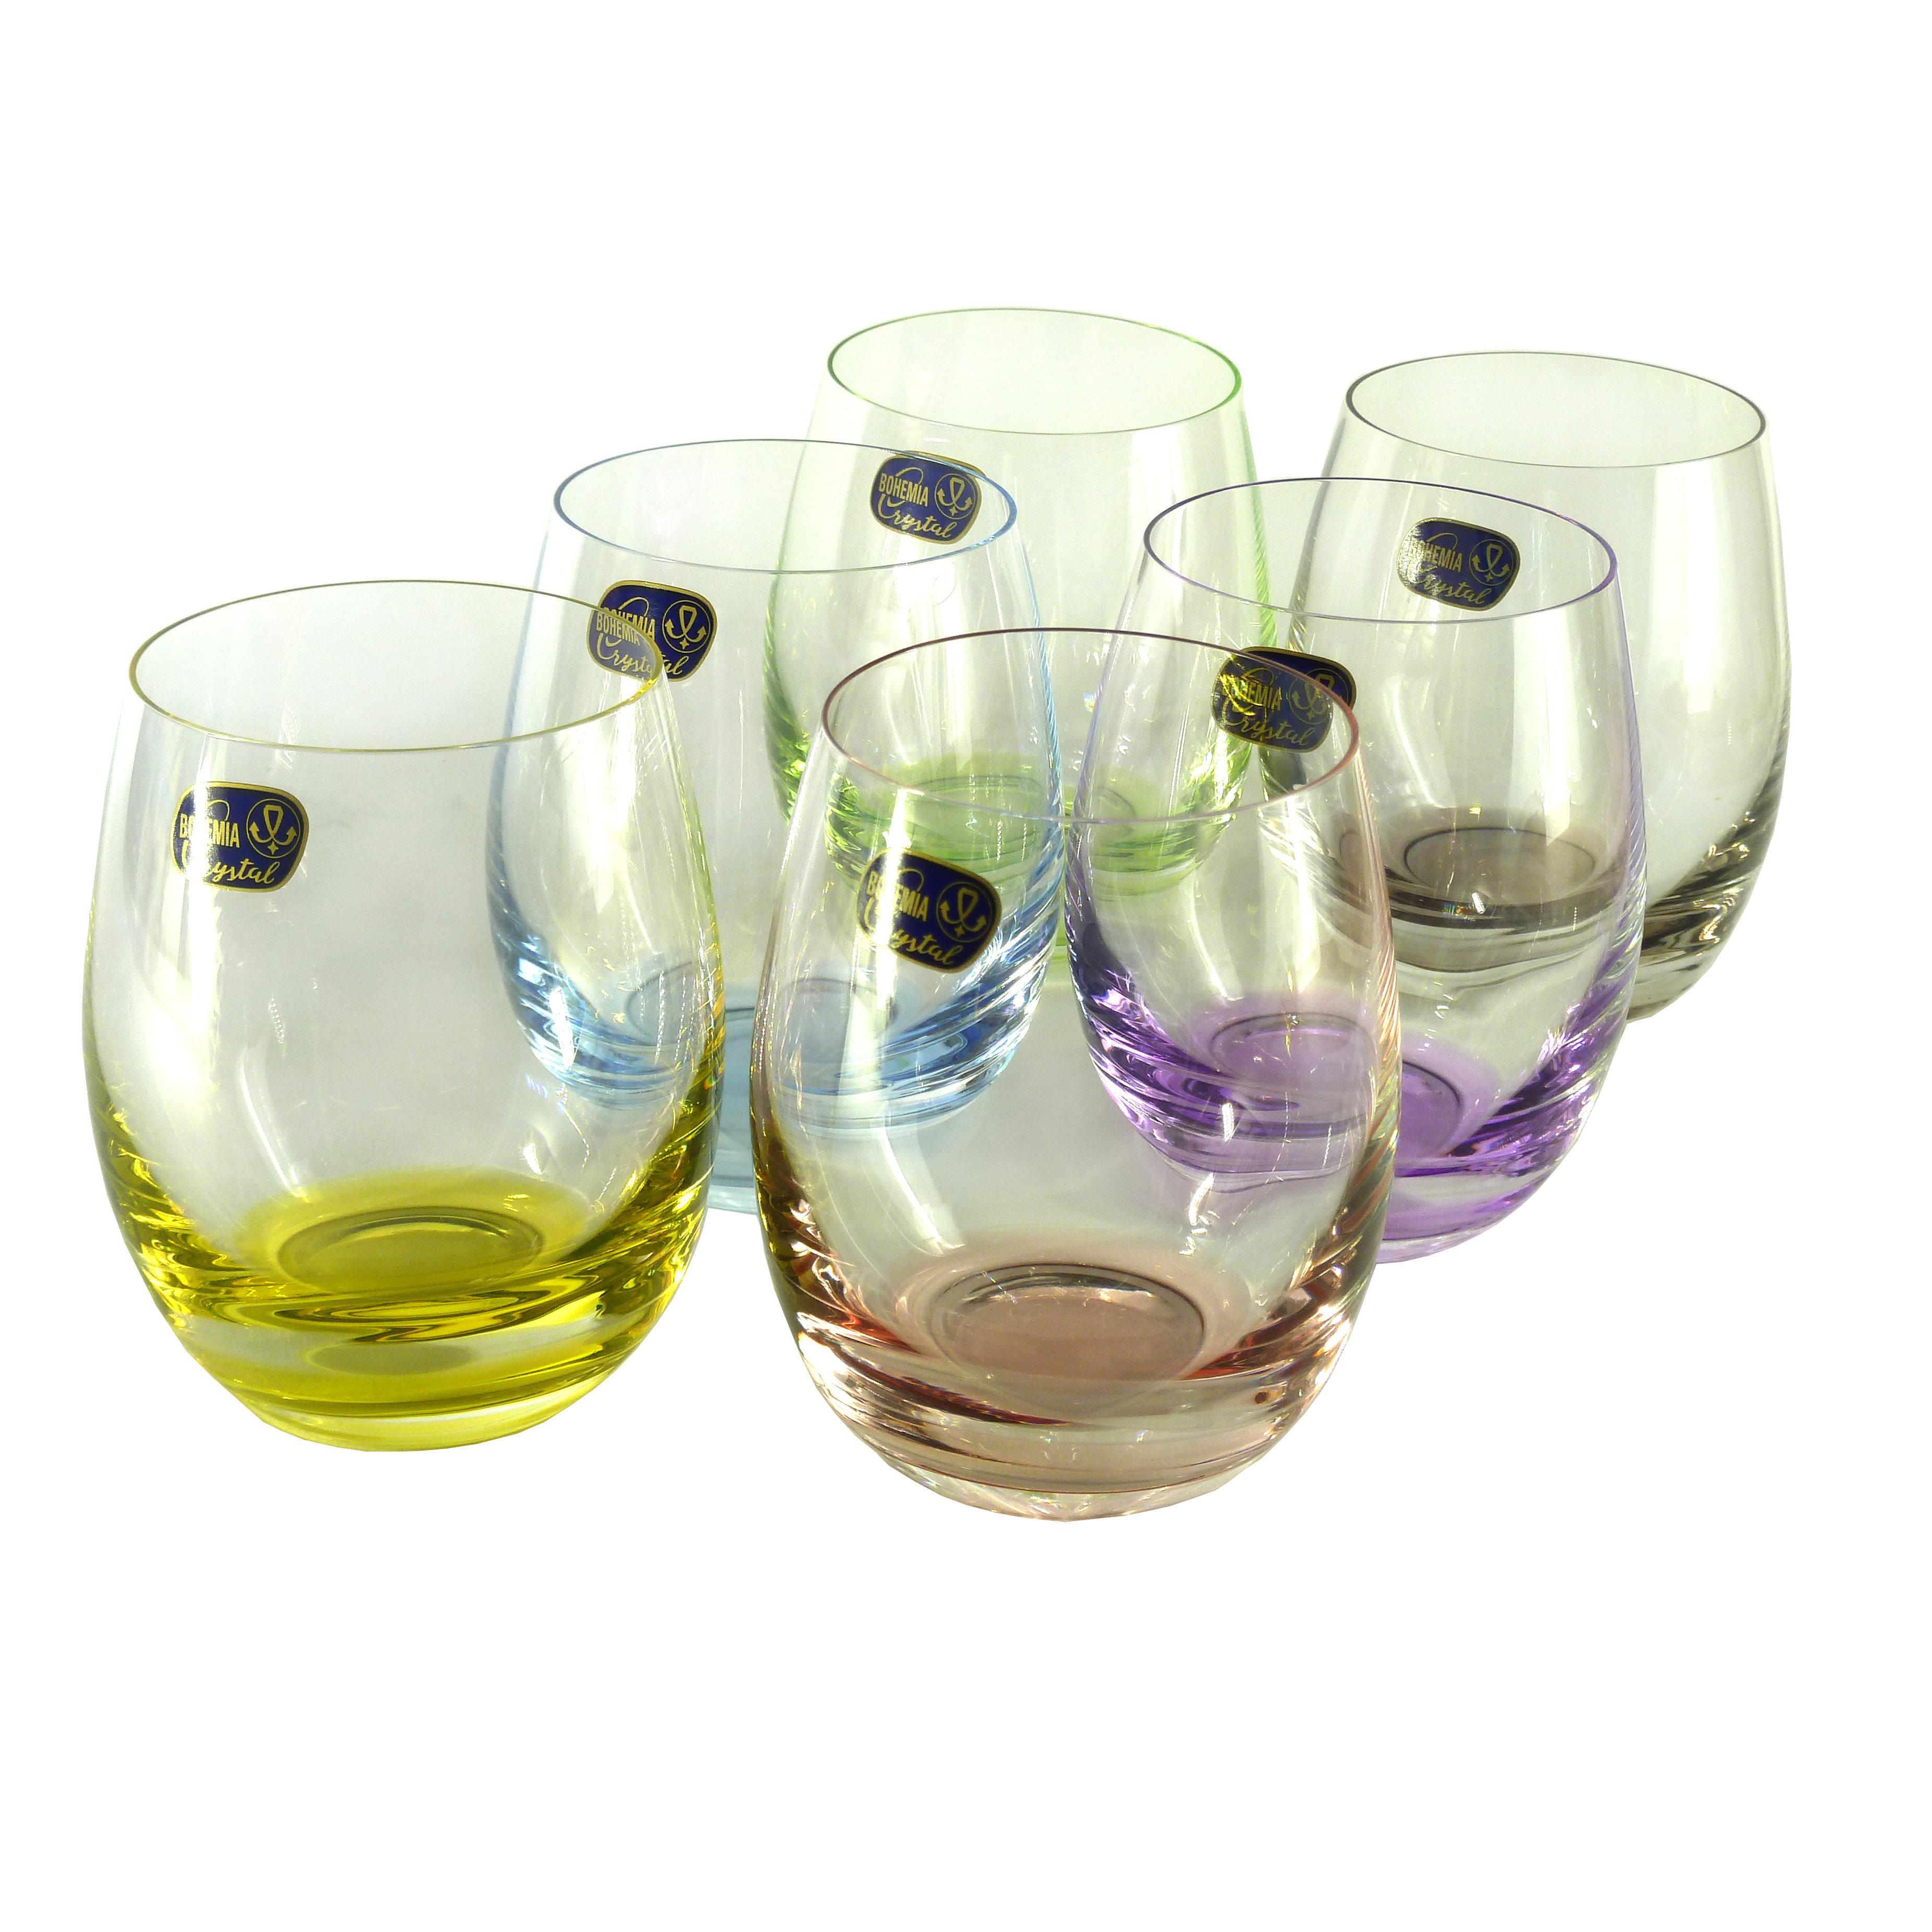 Набор стаканов для виски Клаб, 260 мл., 6 шт.